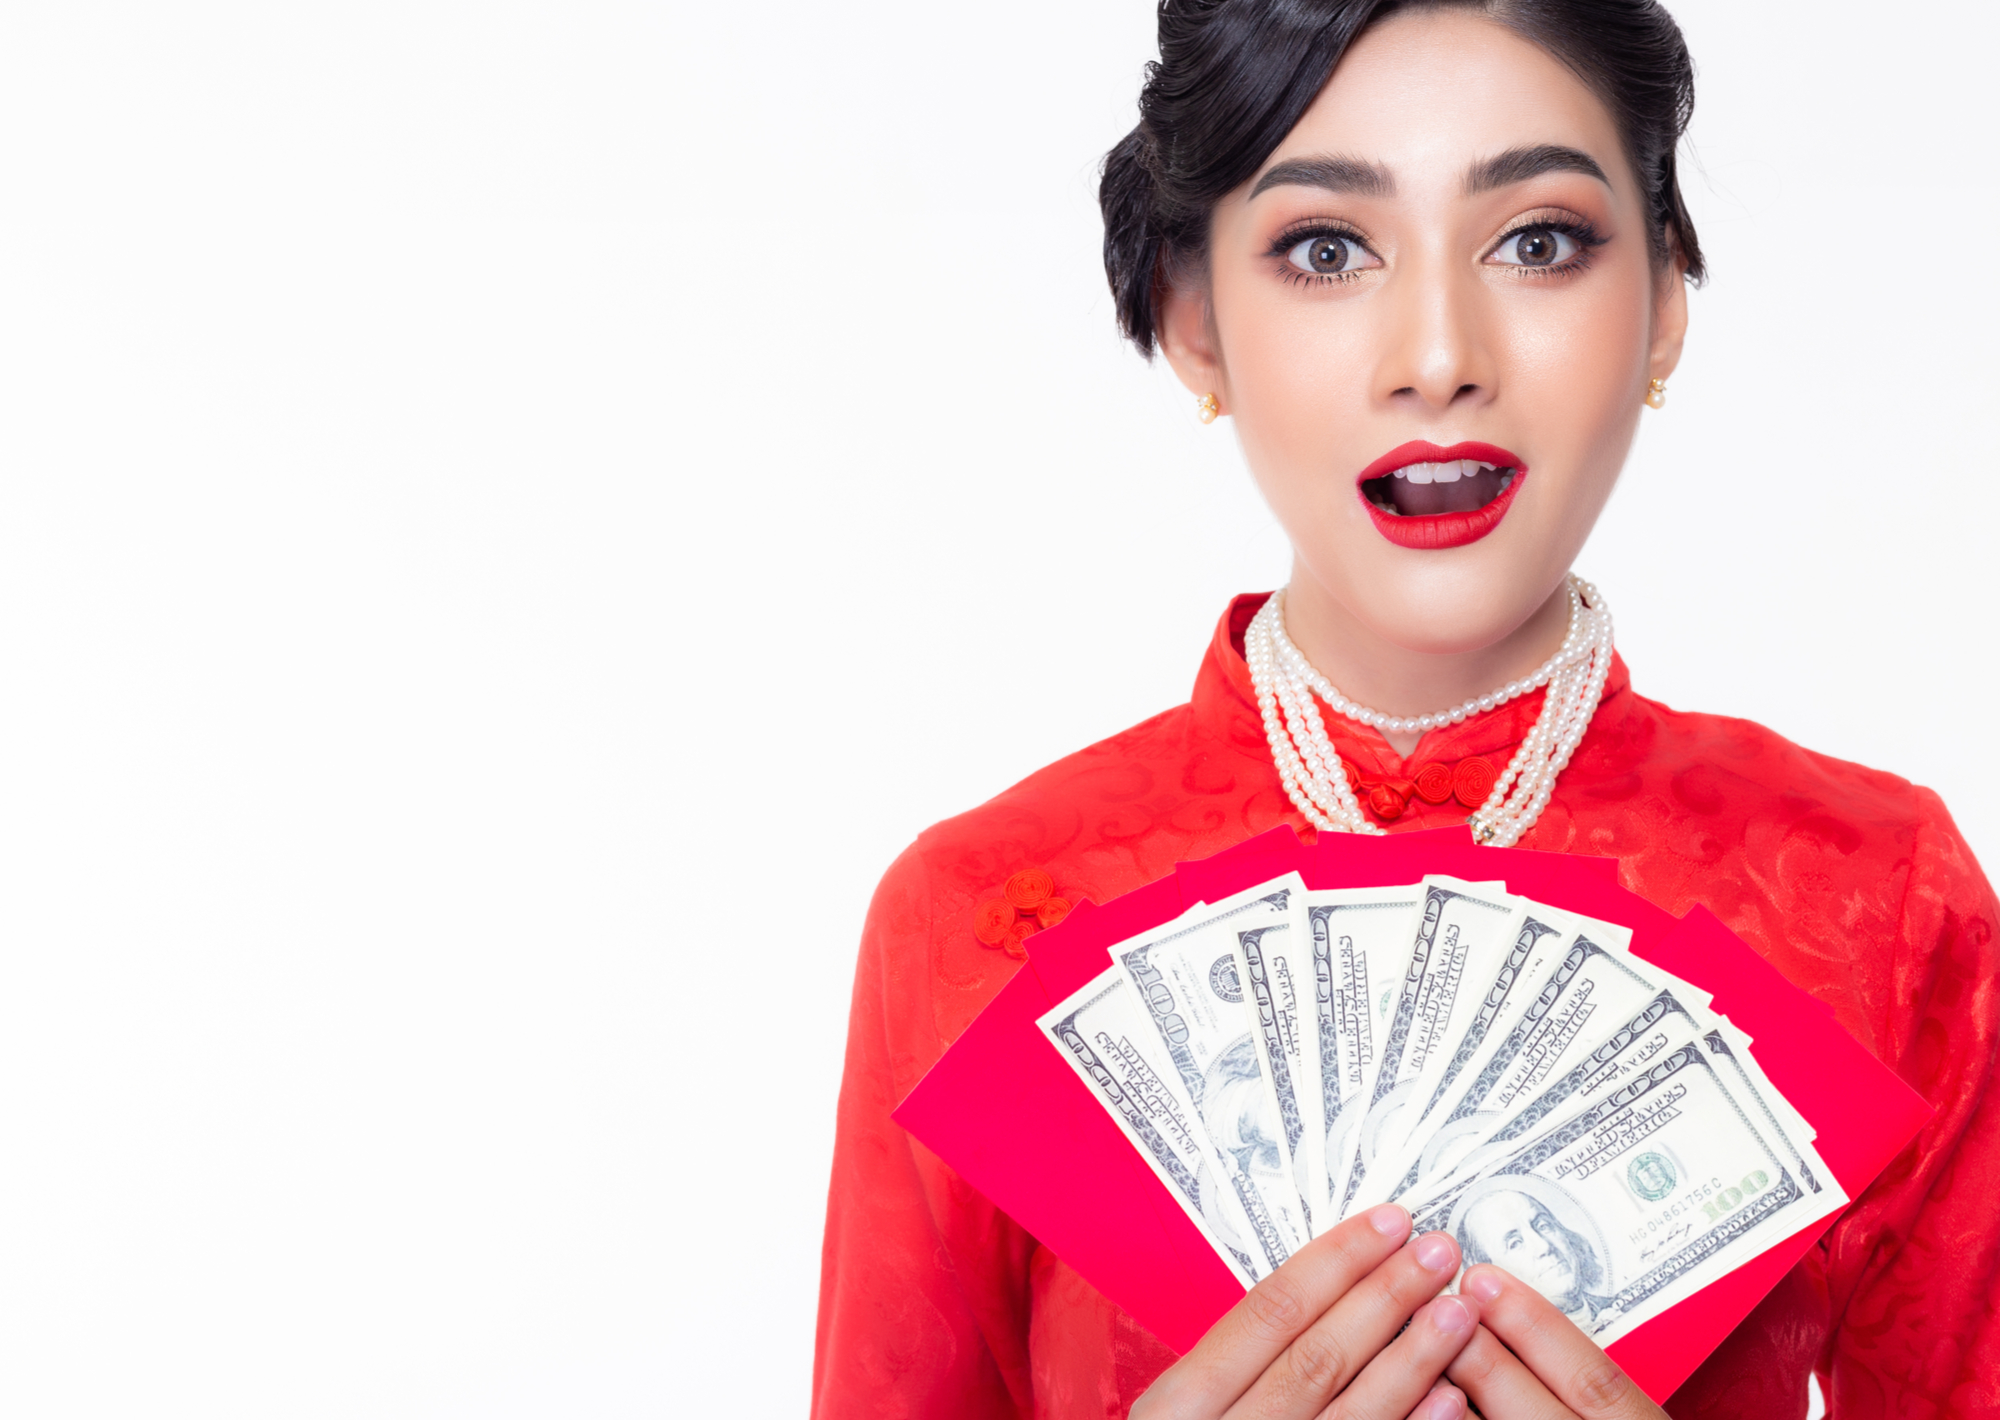 Keuangan Zodiak yang Beruntung Besok, 7 Zodiak Jus